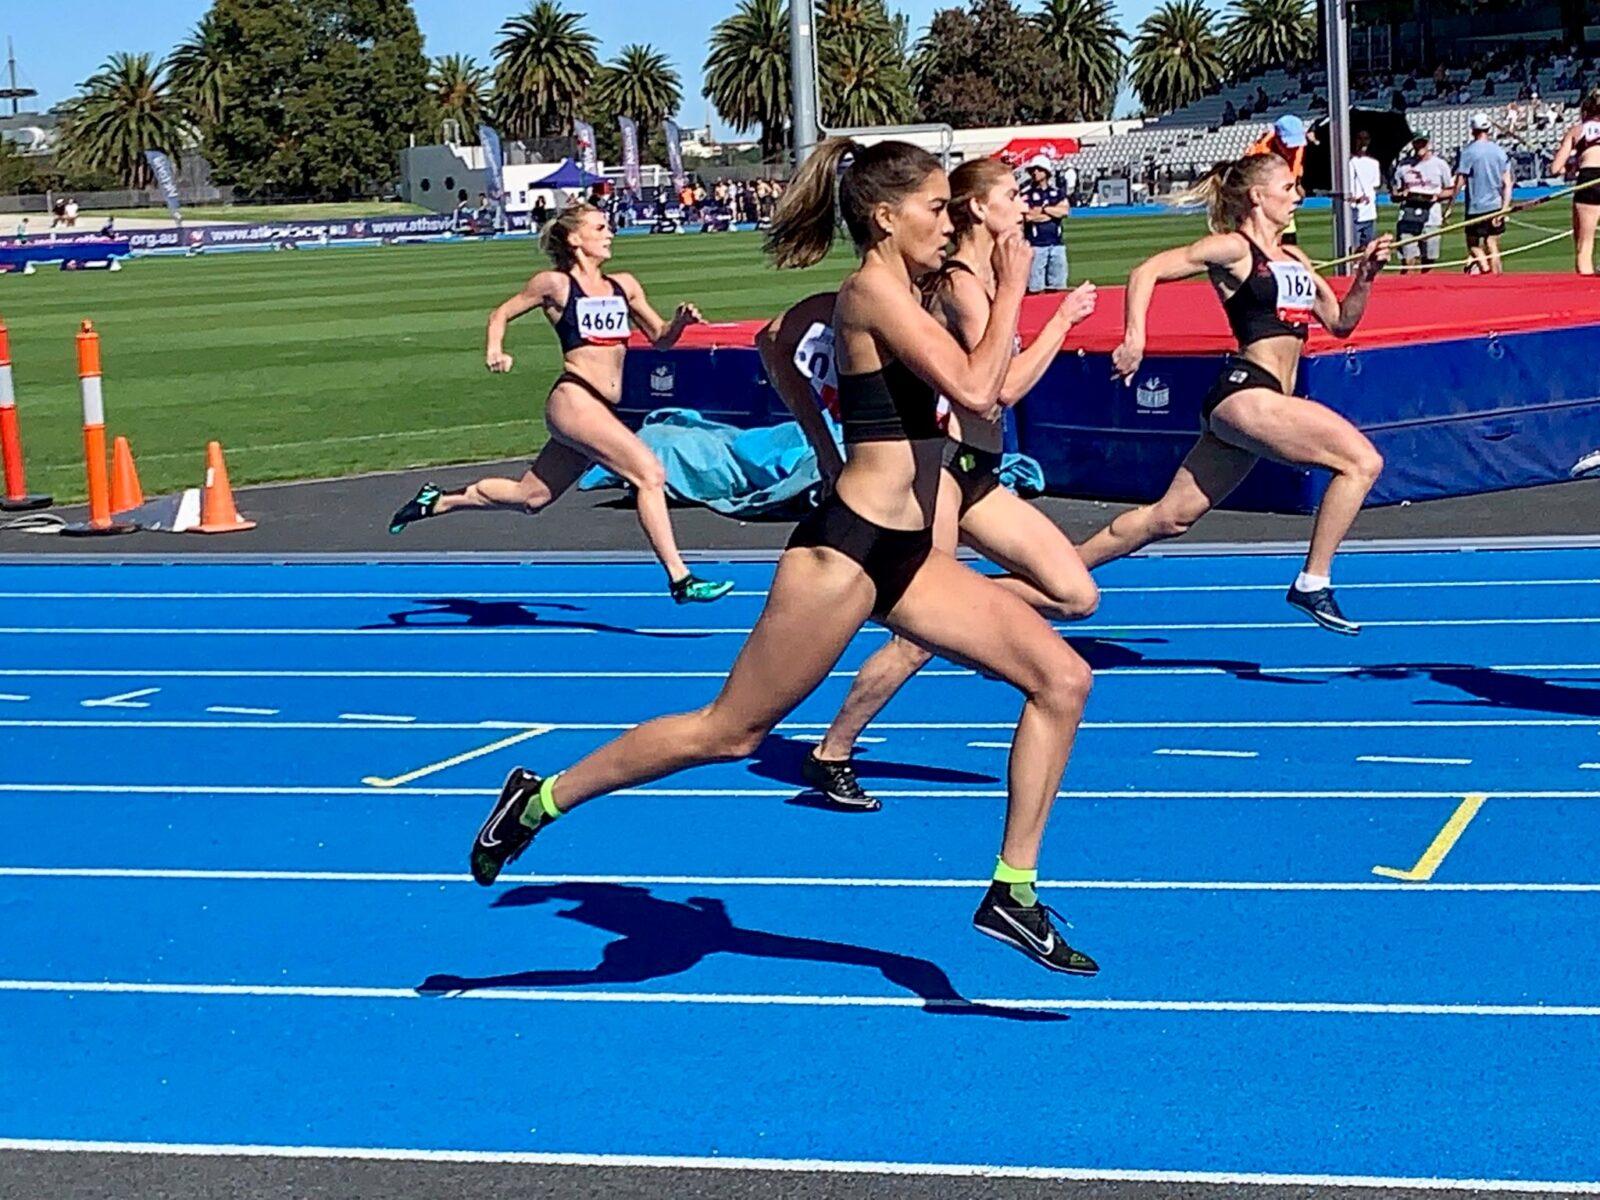 Women sprinting